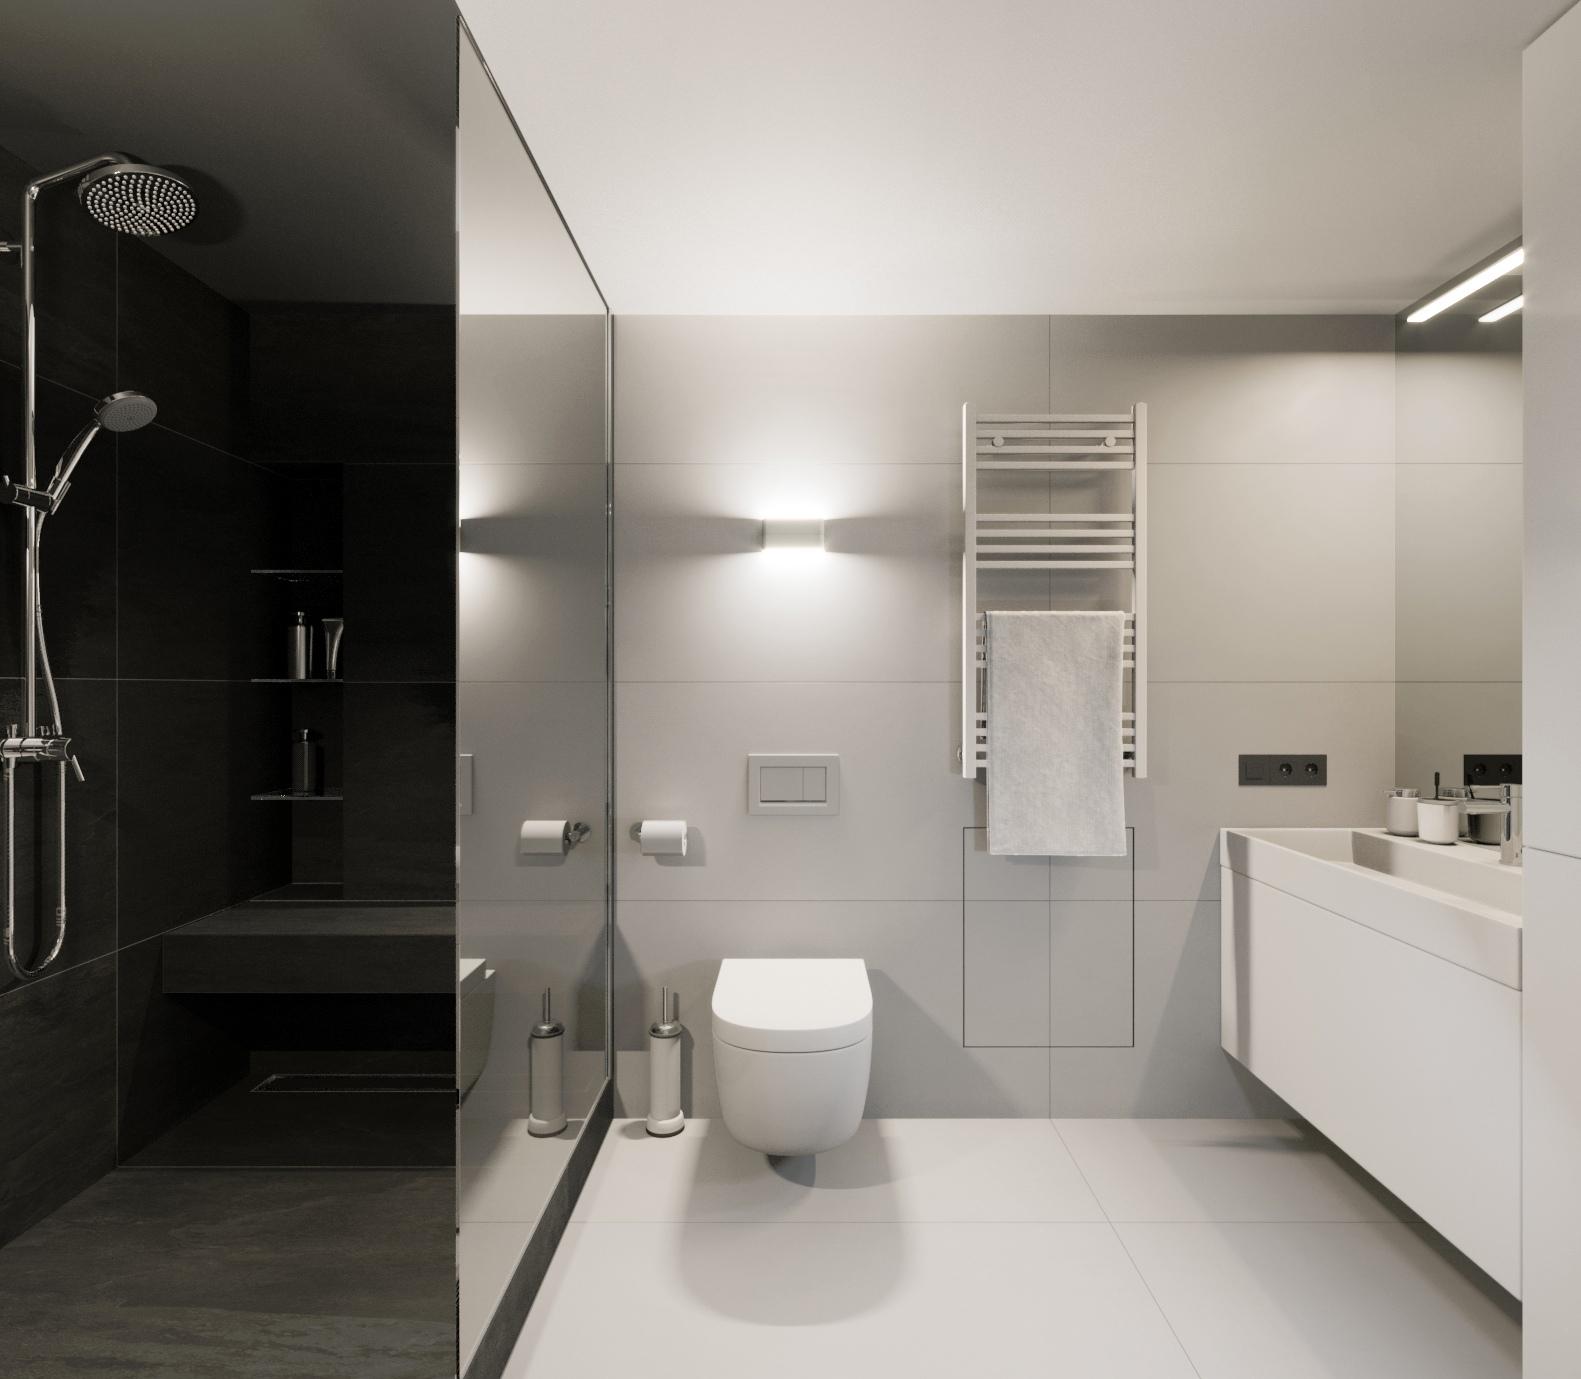 Двухуровневая квартира-студия для холостяка.